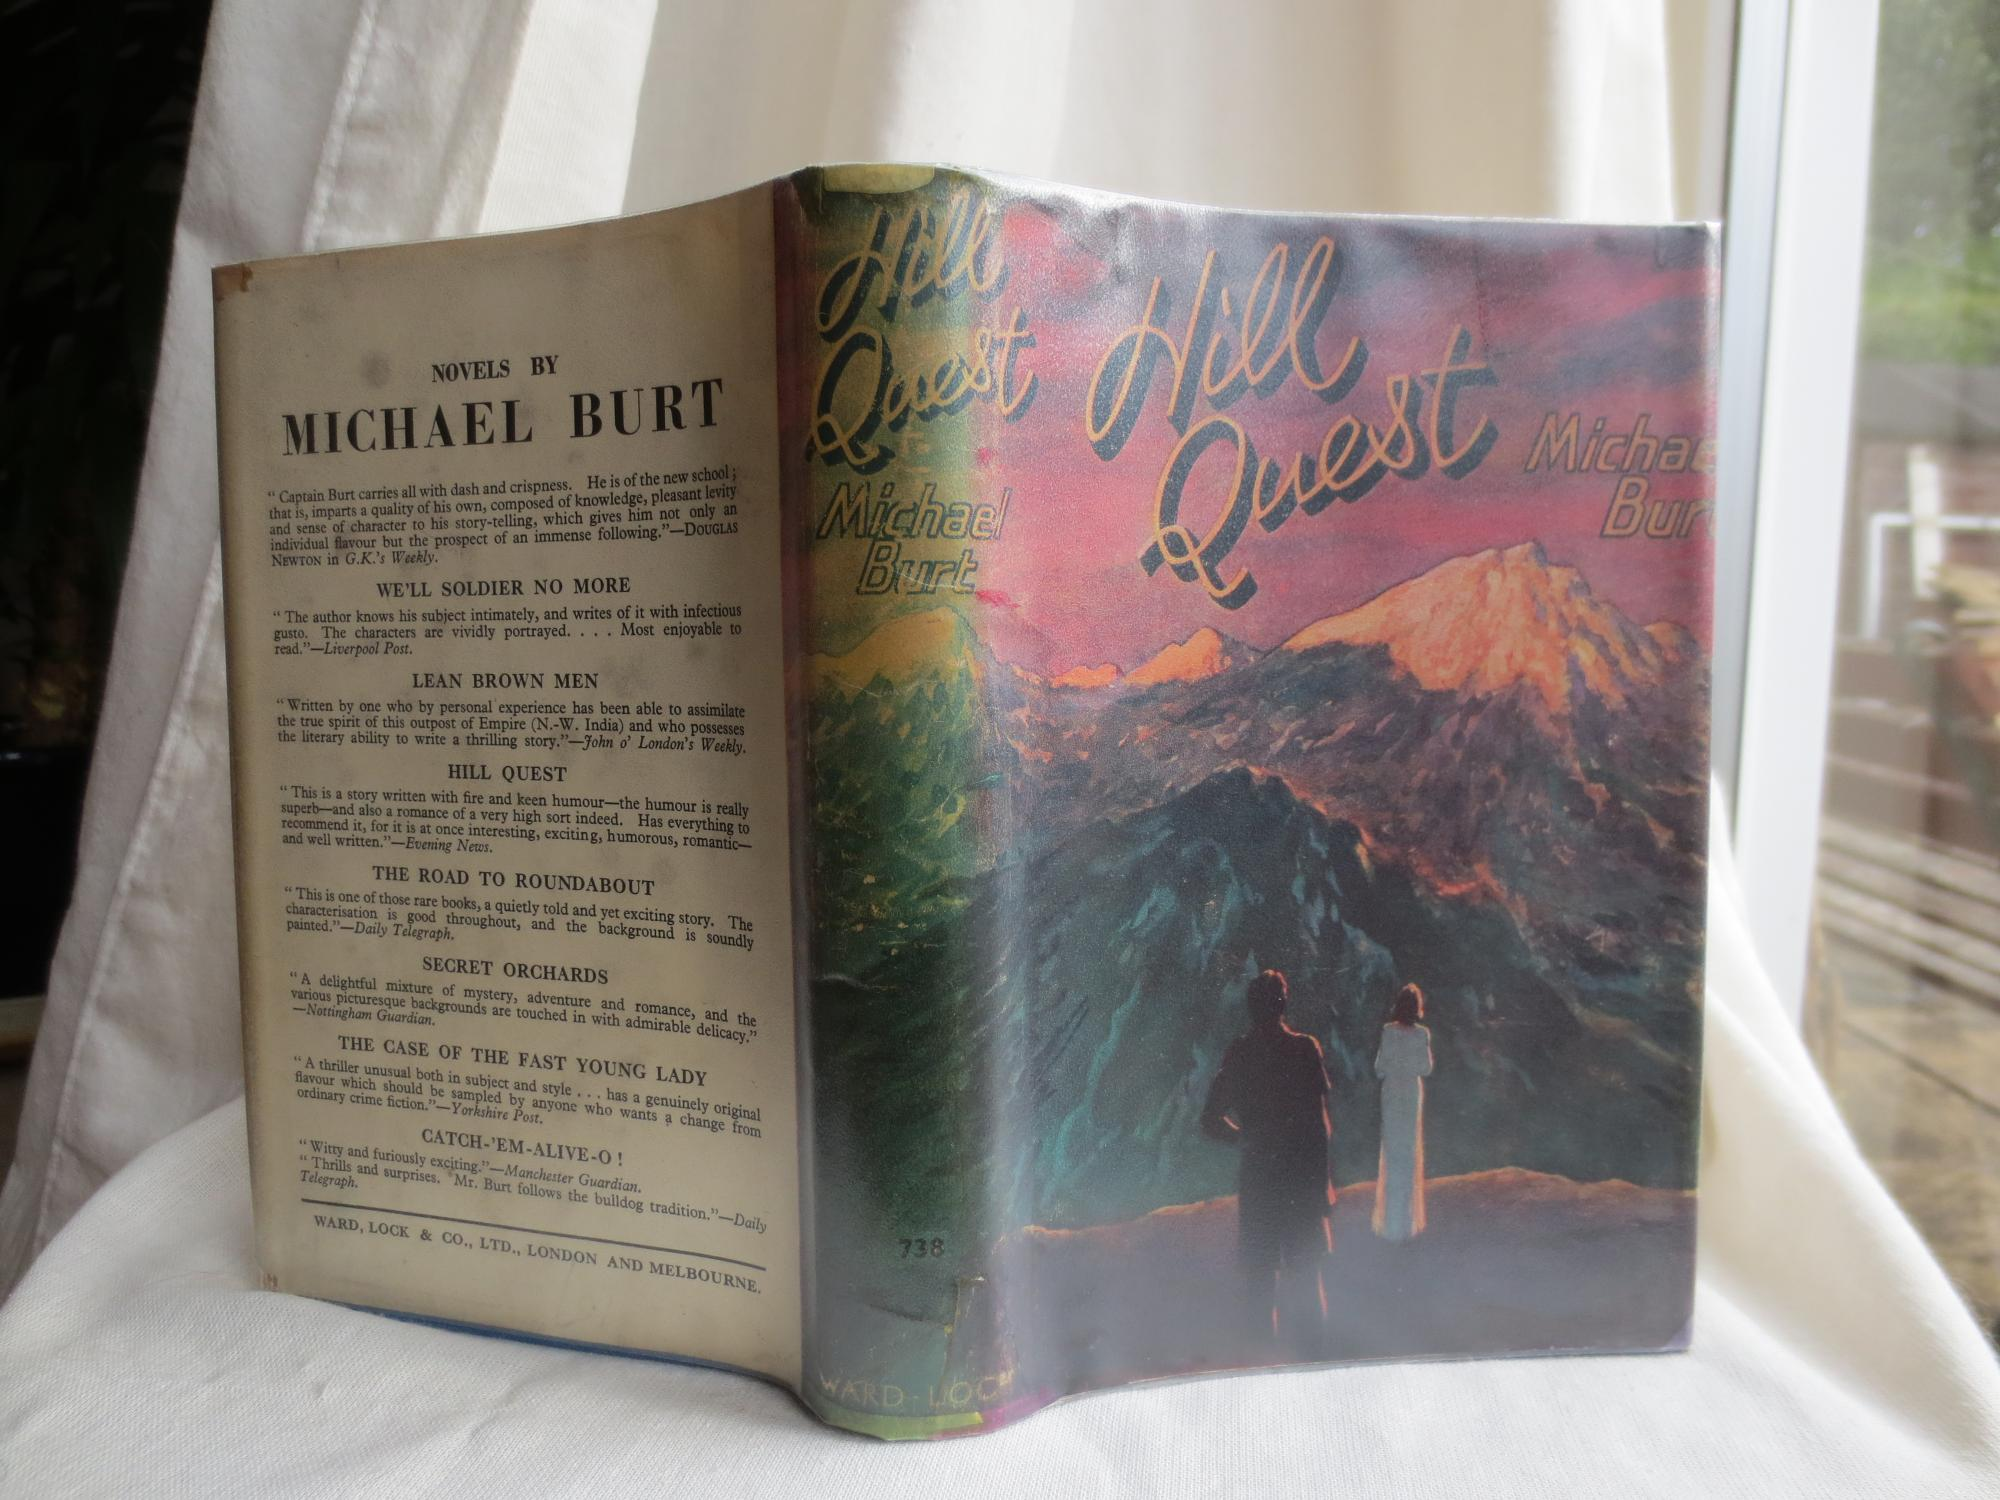 Hill Quest: Burt, Michael